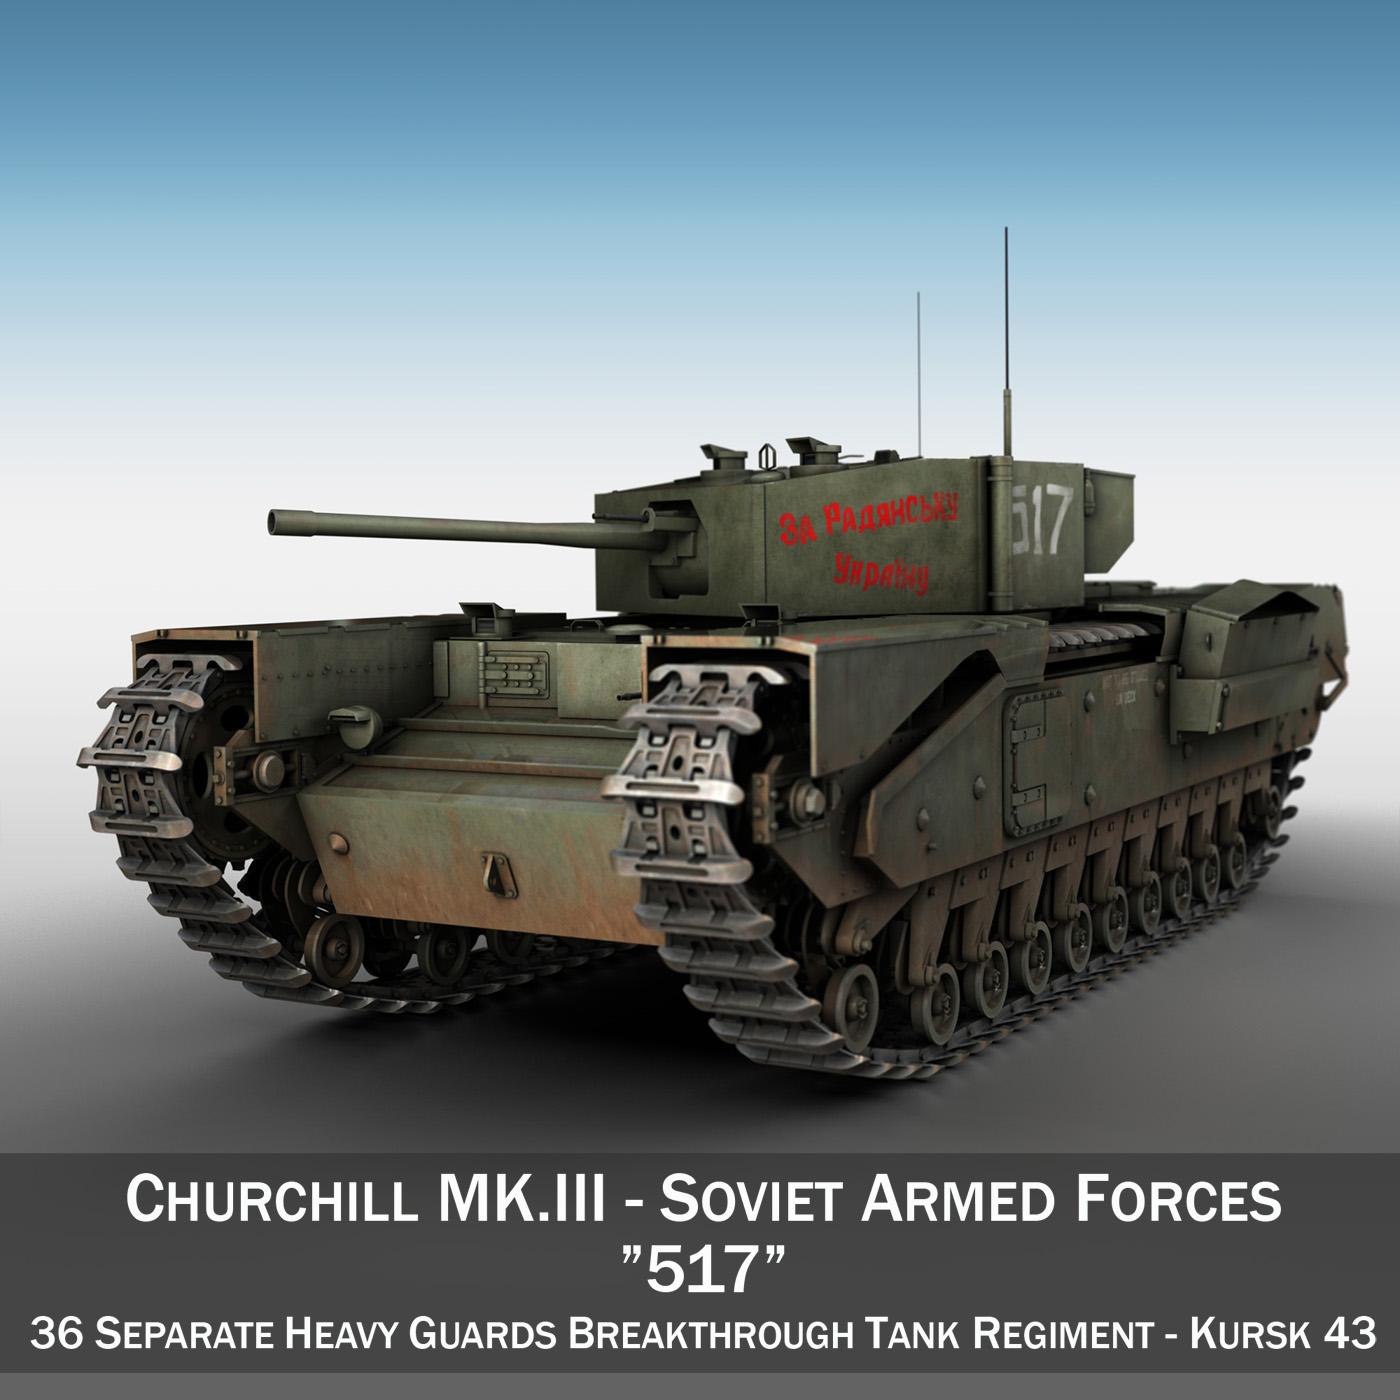 Churchill MK III - 517 - Soviet Army 3d model 3ds fbx c4d lwo lws lw obj 272974